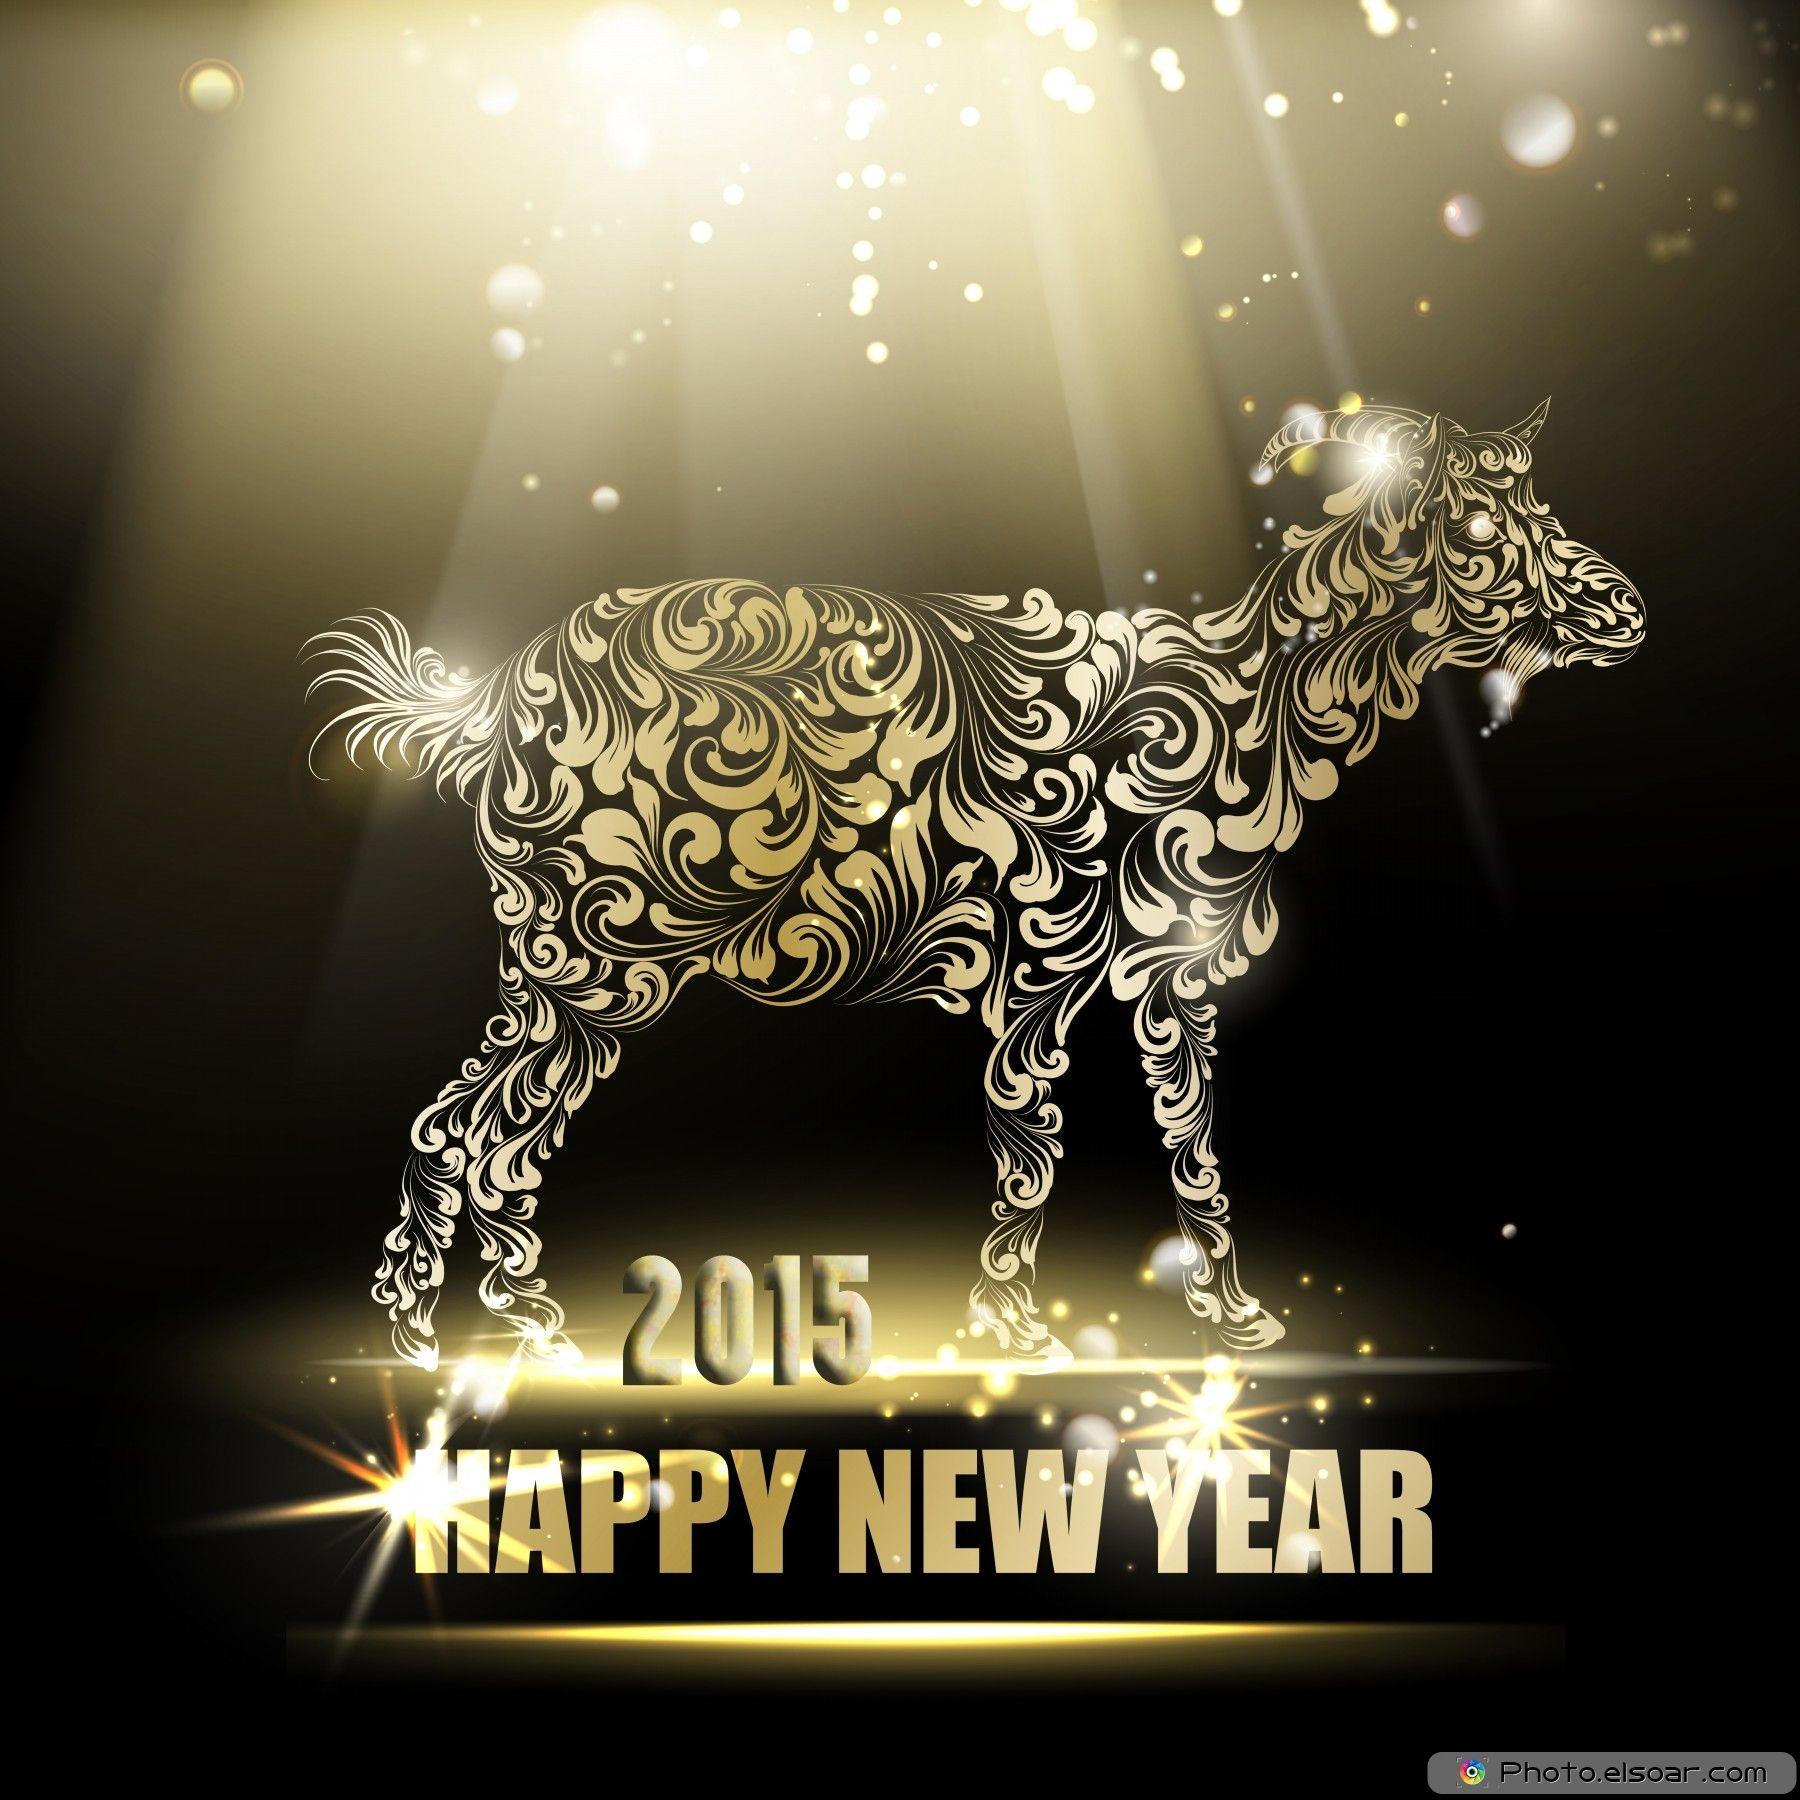 Happy Chinese New Year 2015 Celebration Card Illustrations